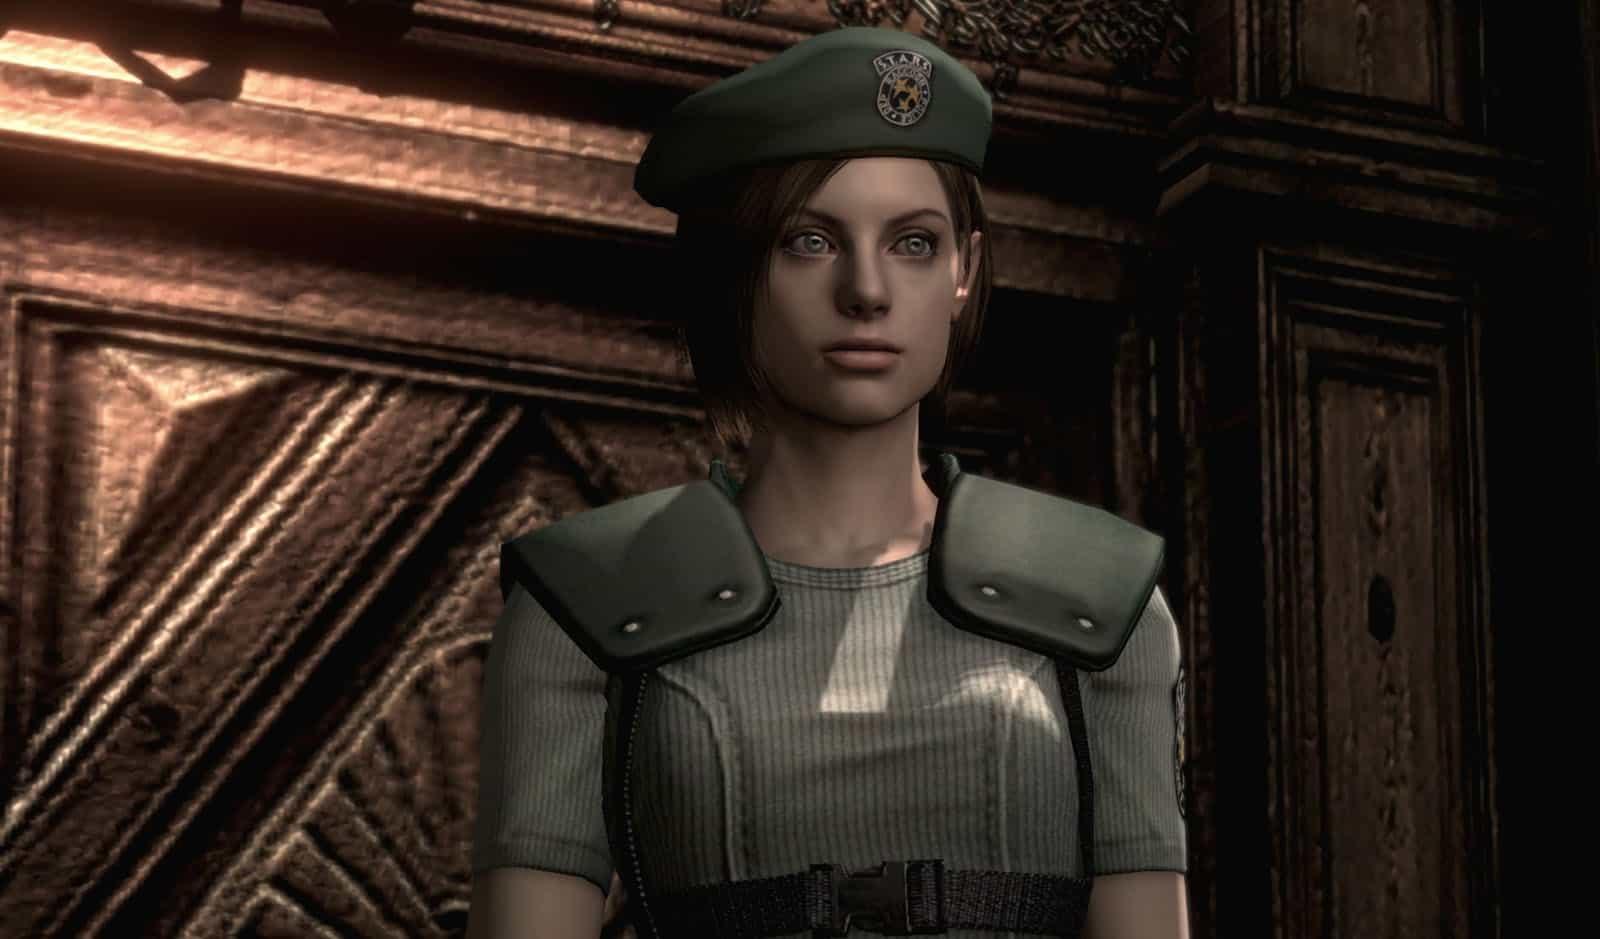 Capcom confirme les portages de Resident Evil, Resident Evil 0 et Resident Evil 4 sur Nintendo Switch